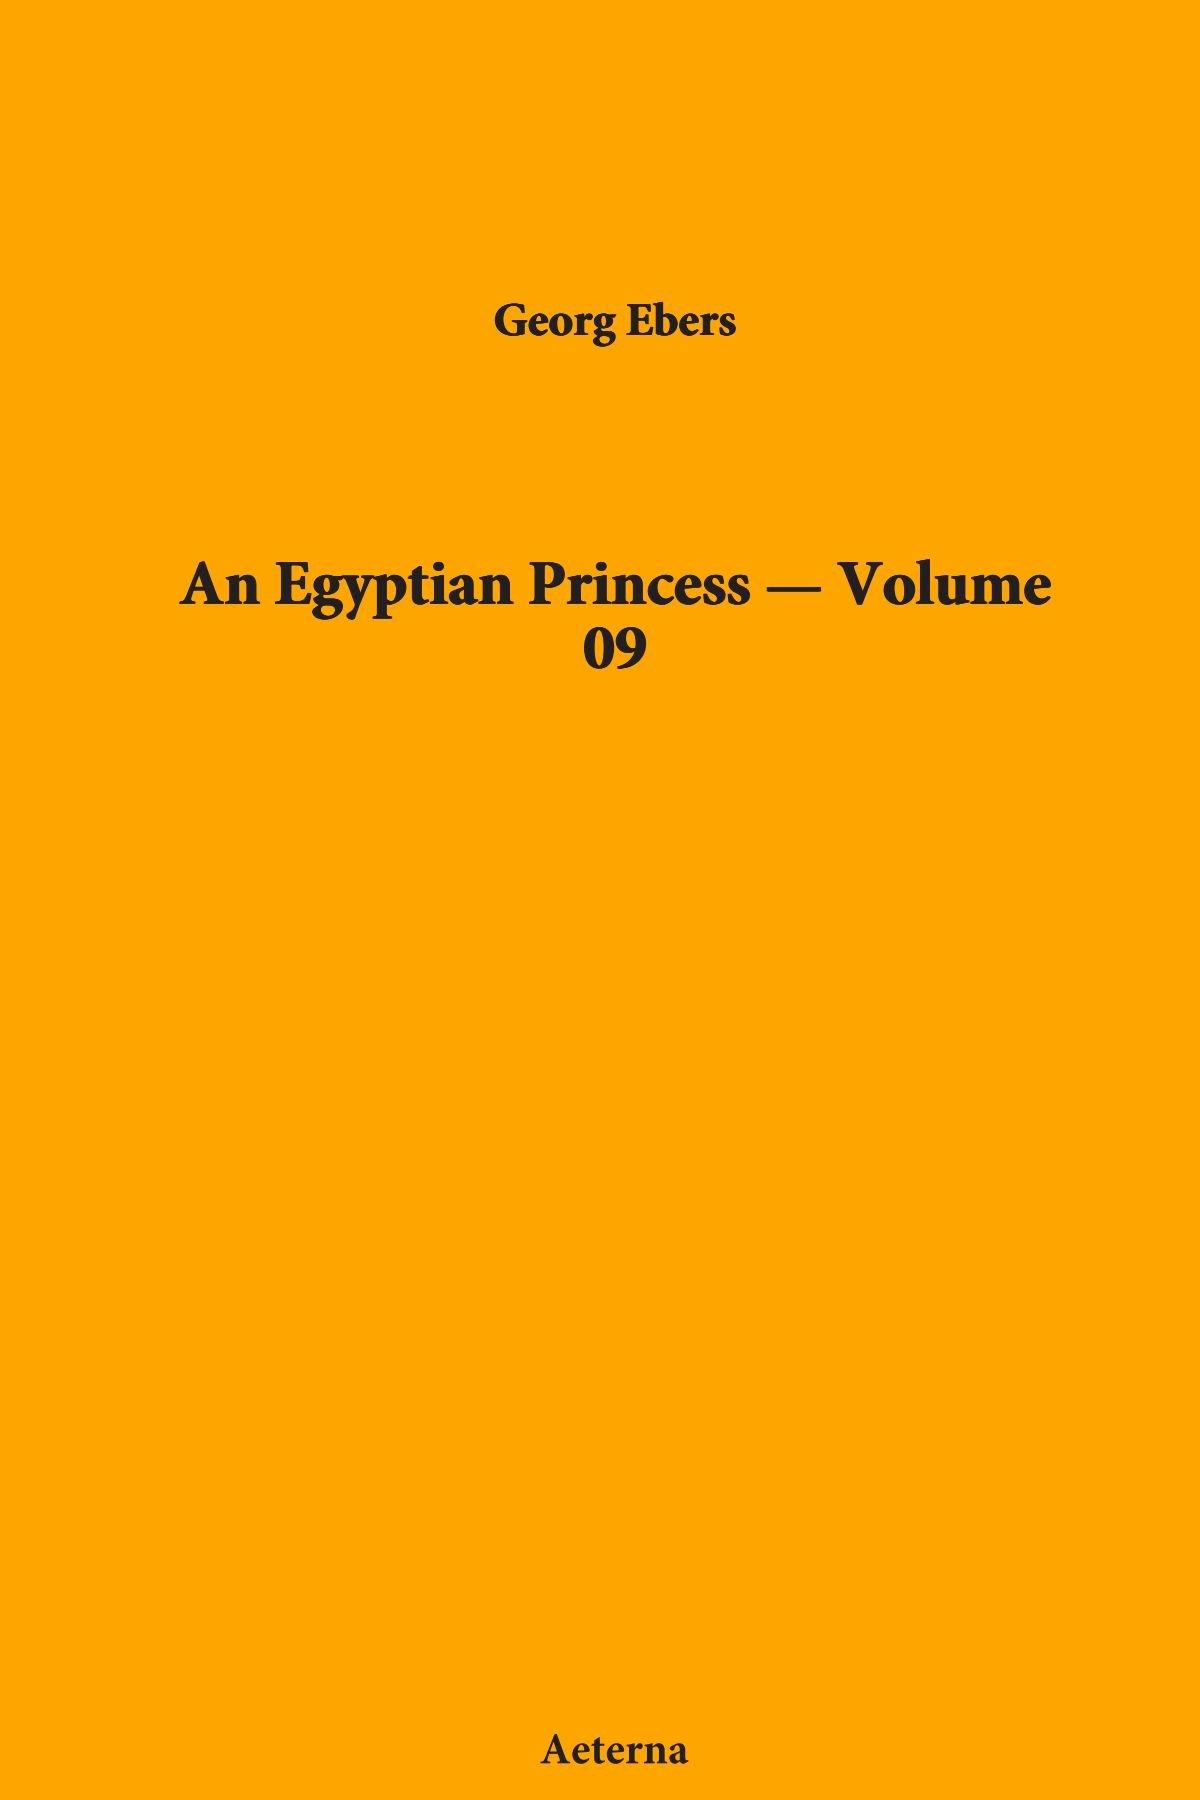 An Egyptian Princess — Volume 09 PDF